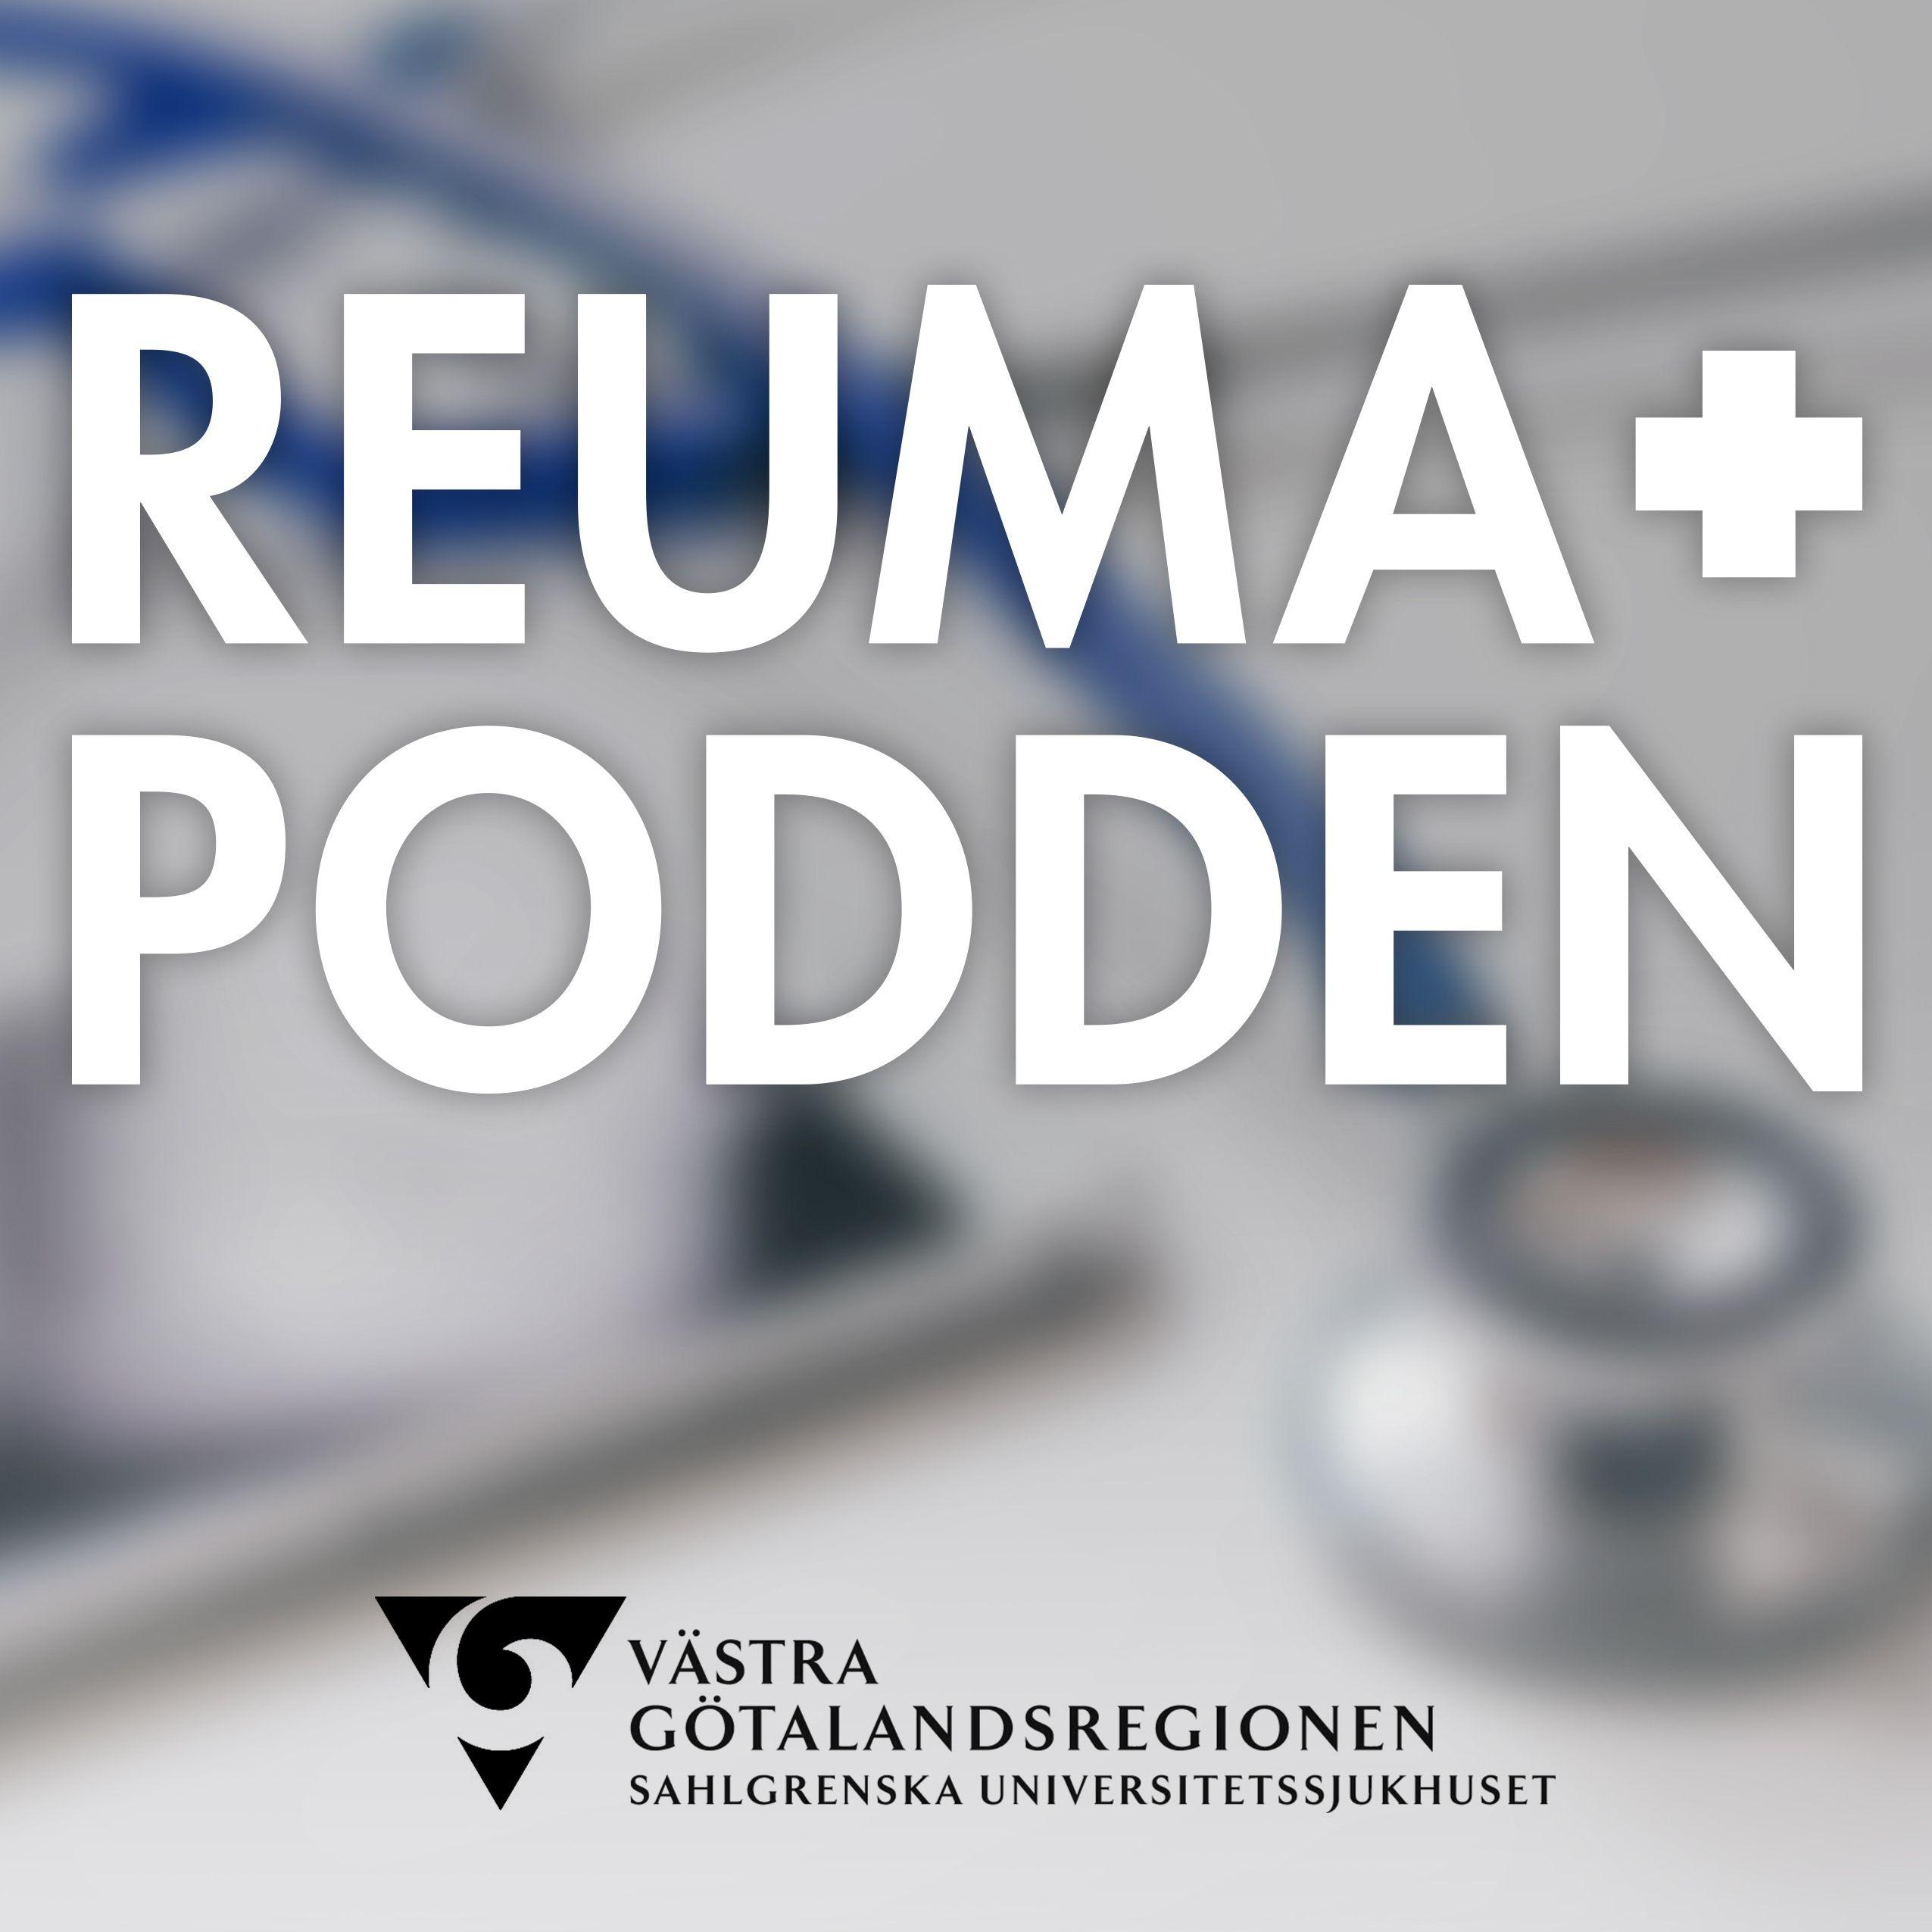 Reumatologkliniken, Sahlgrenska Sjukhuset